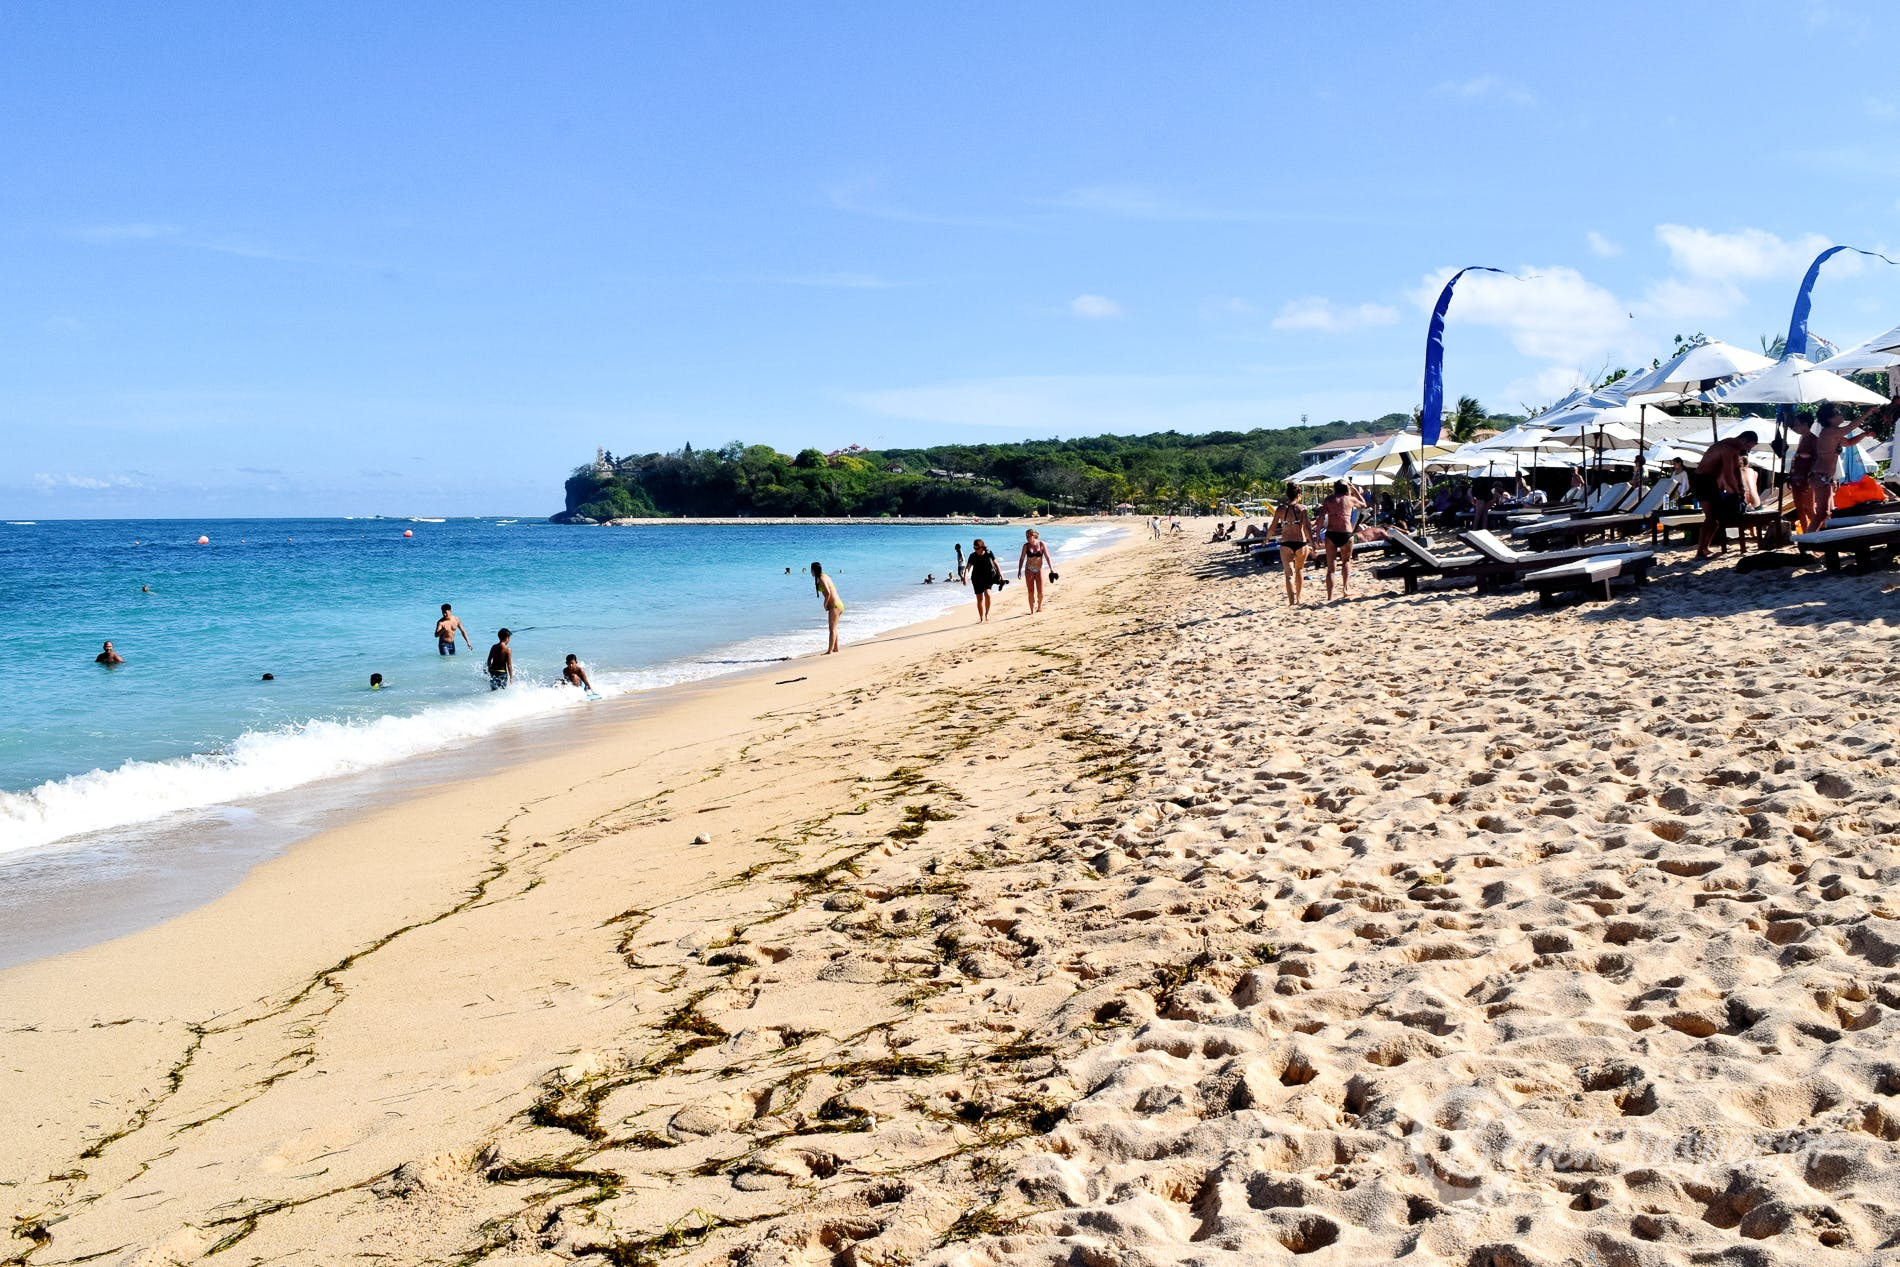 Beach Geger Beach, Bali, Indonesia